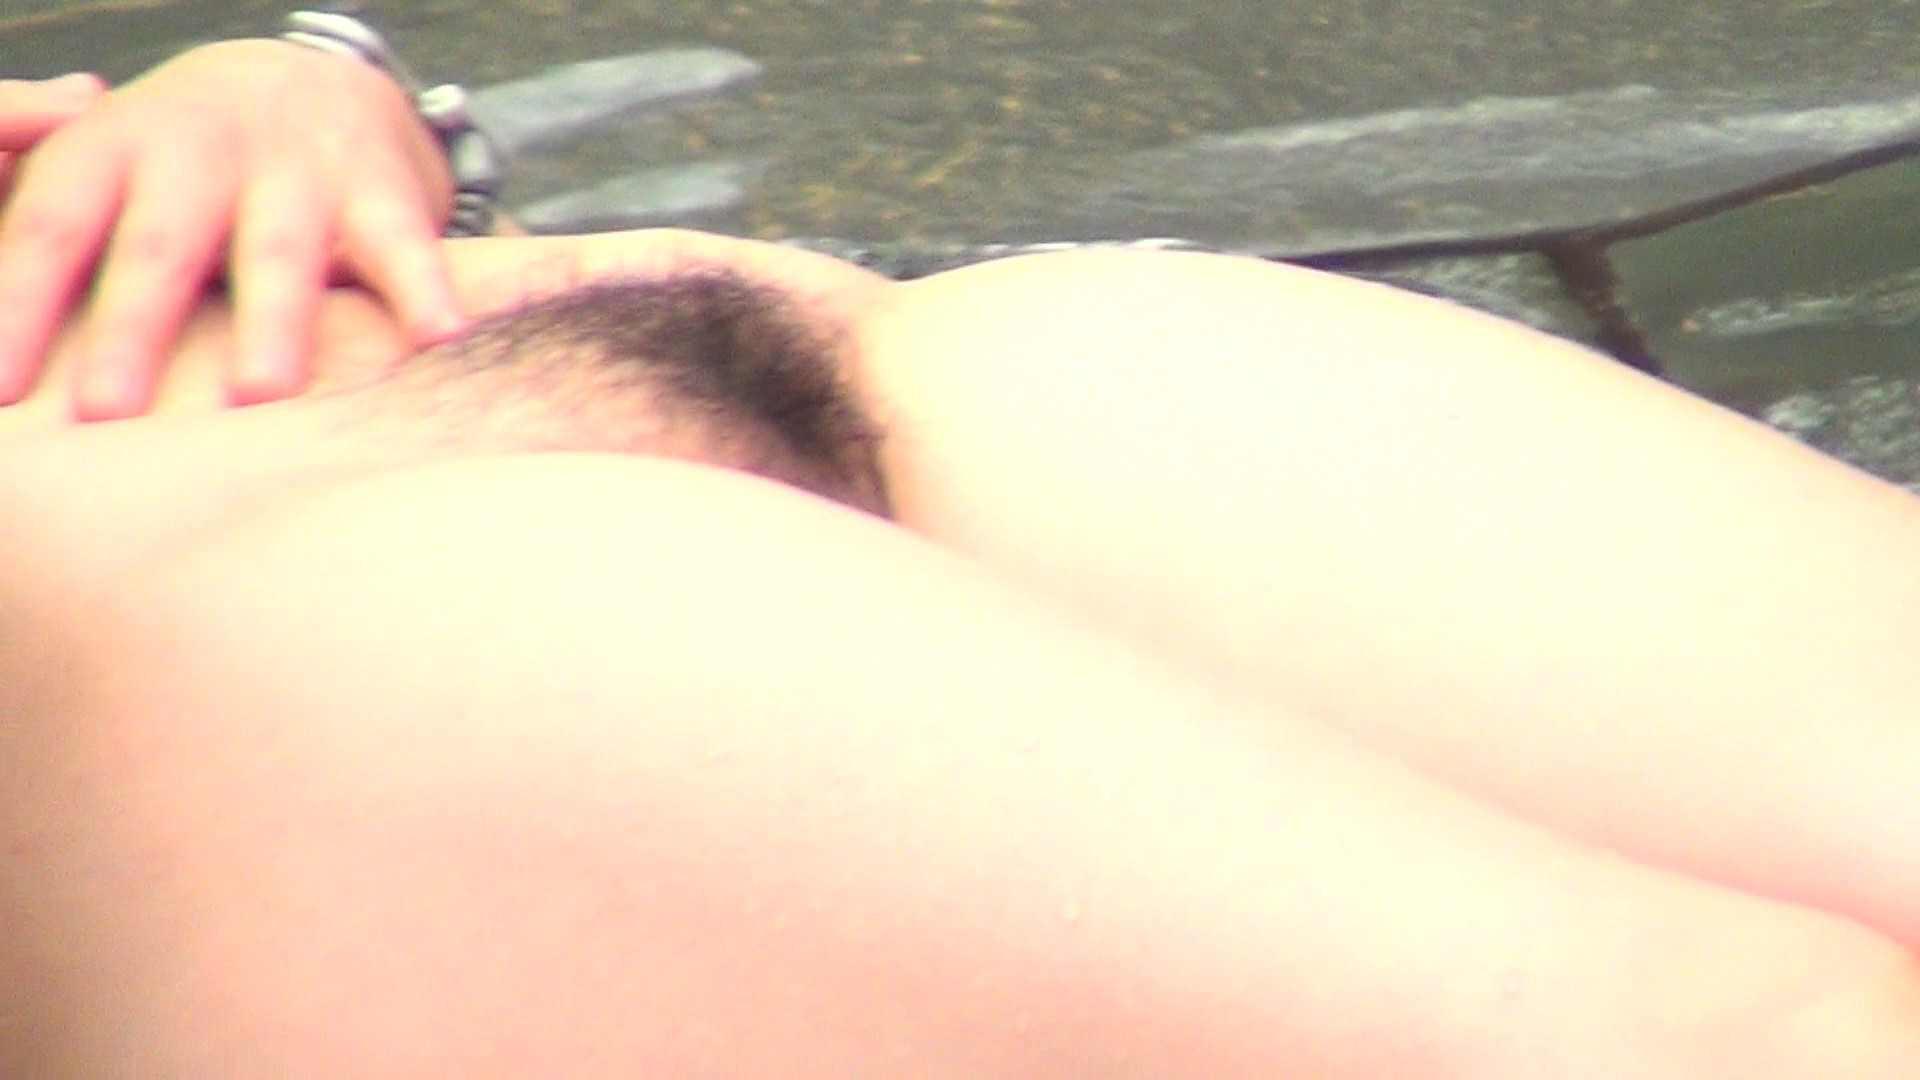 Aquaな露天風呂Vol.310 盗撮師作品 セックス画像 72pic 32